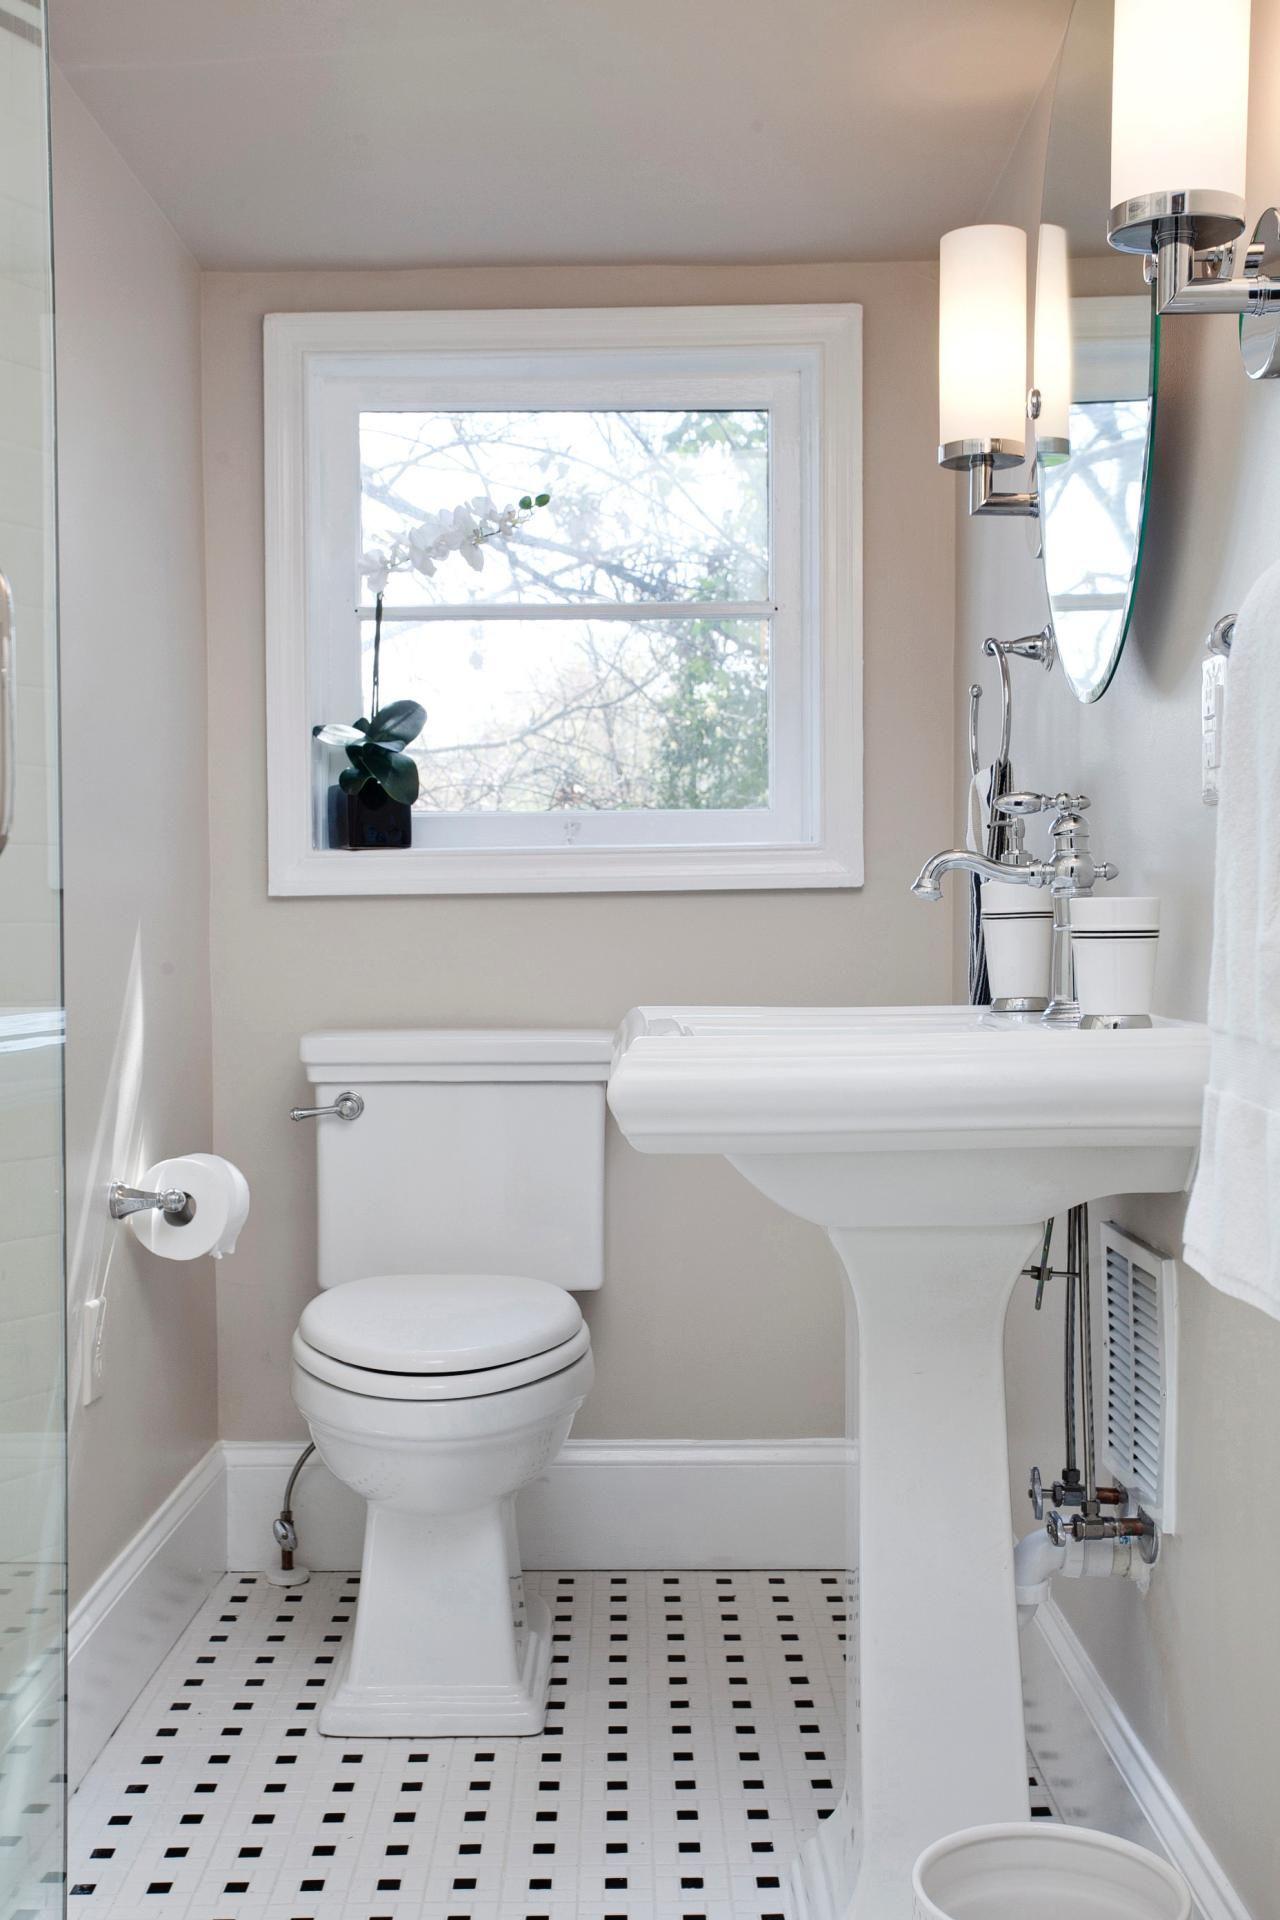 Transitional Bathroom Boasts Retro Black & White Tile